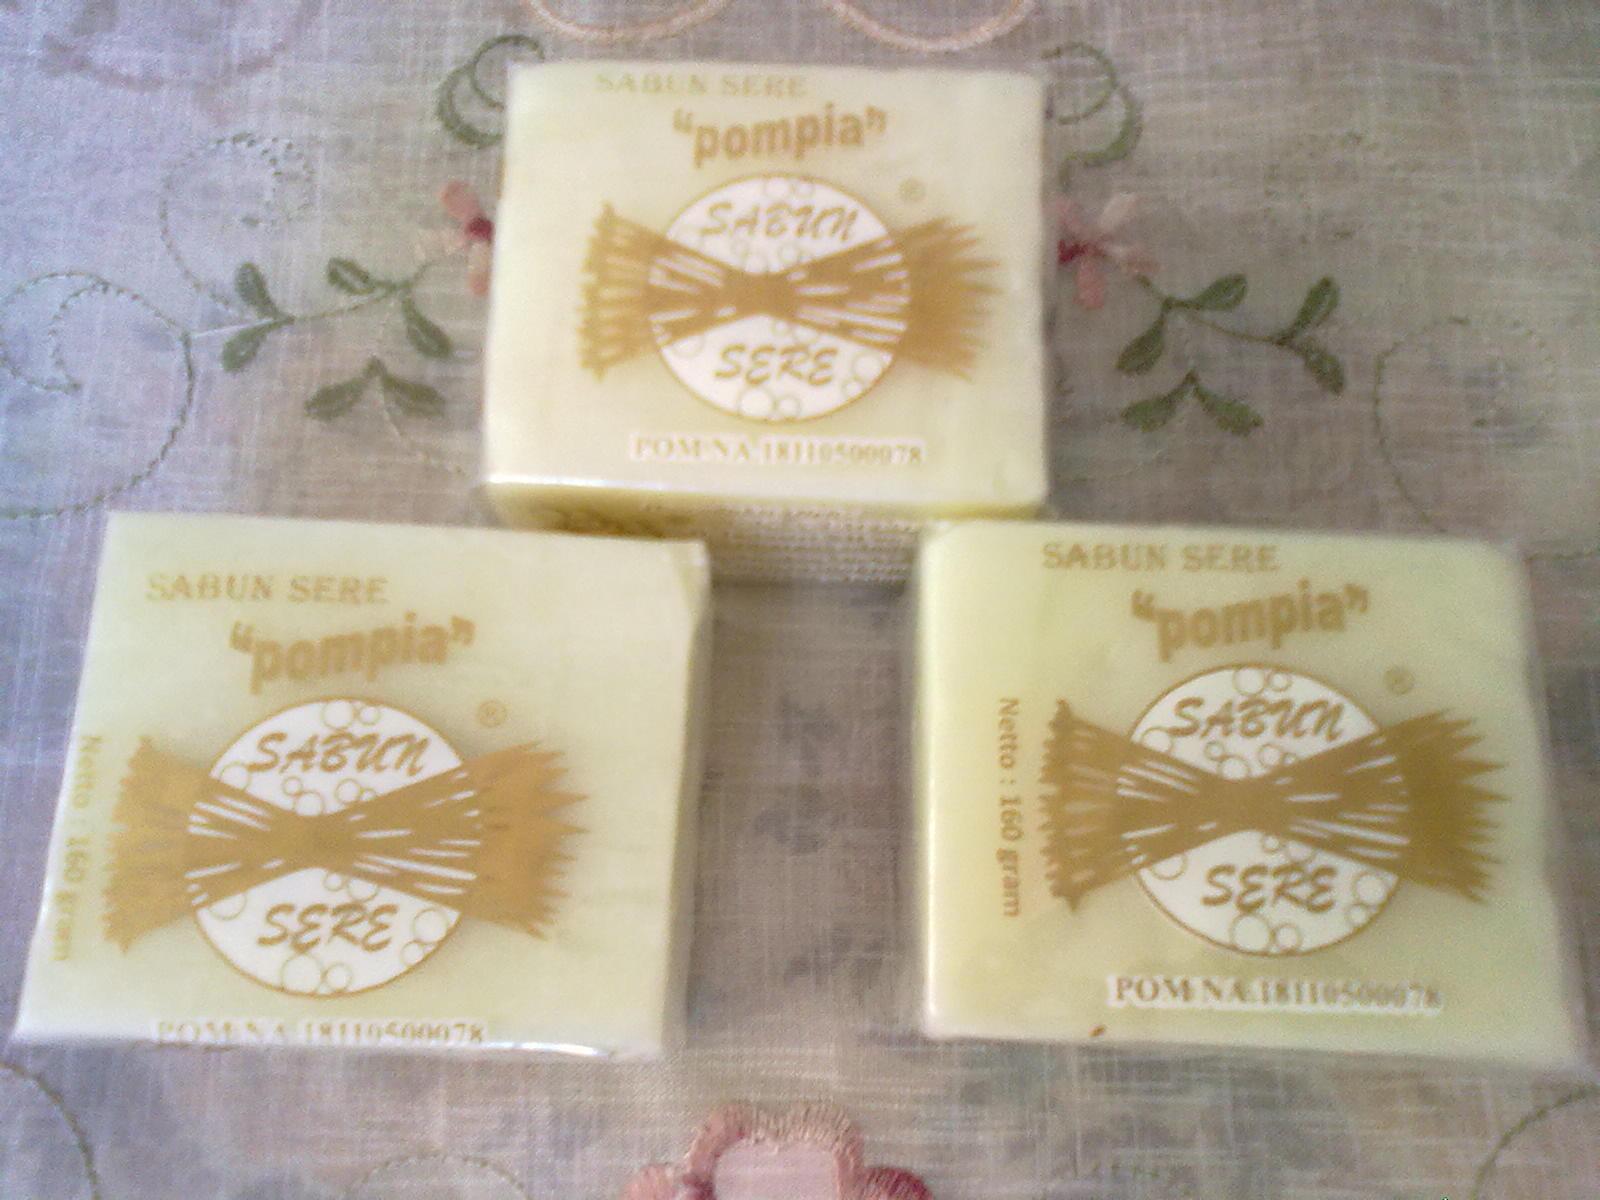 Sabun Sereh Herbal Soap Perawatan Kulit Daftar Harga Kecantikan Tashiru Sere Teratai Kotak Penghilang Bau Badan